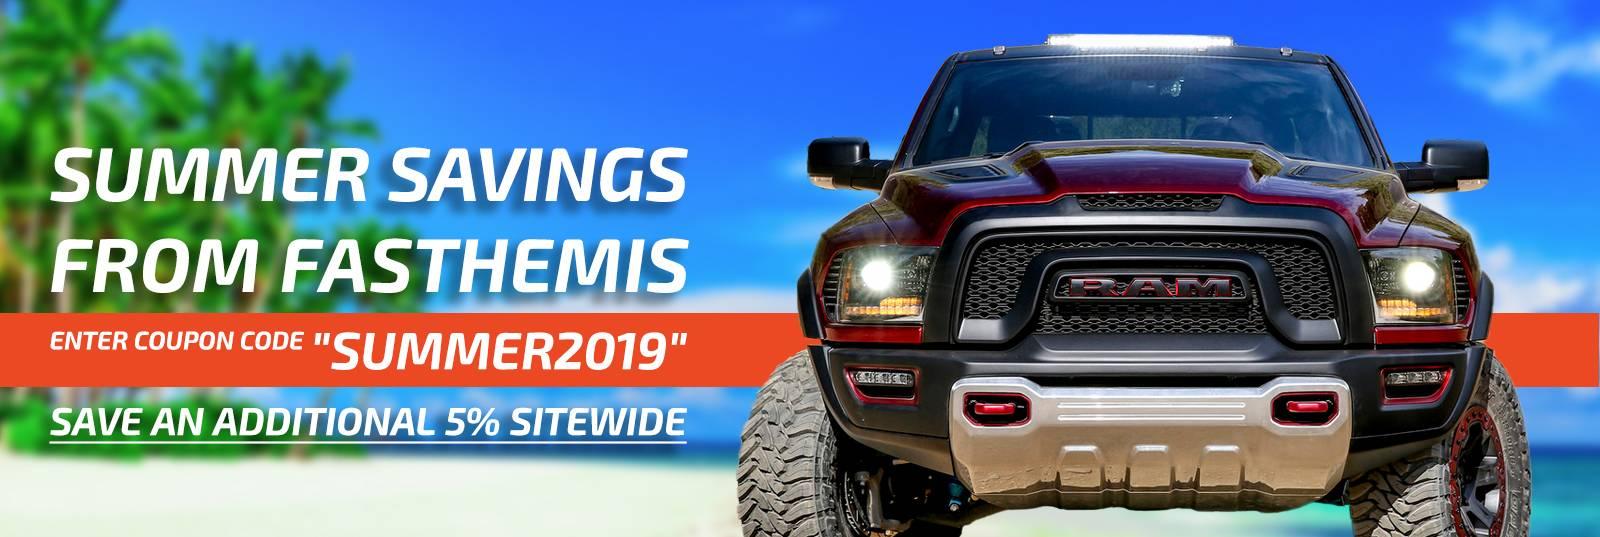 FastHemis com - Hemi Performance Parts & Accessories Superstore